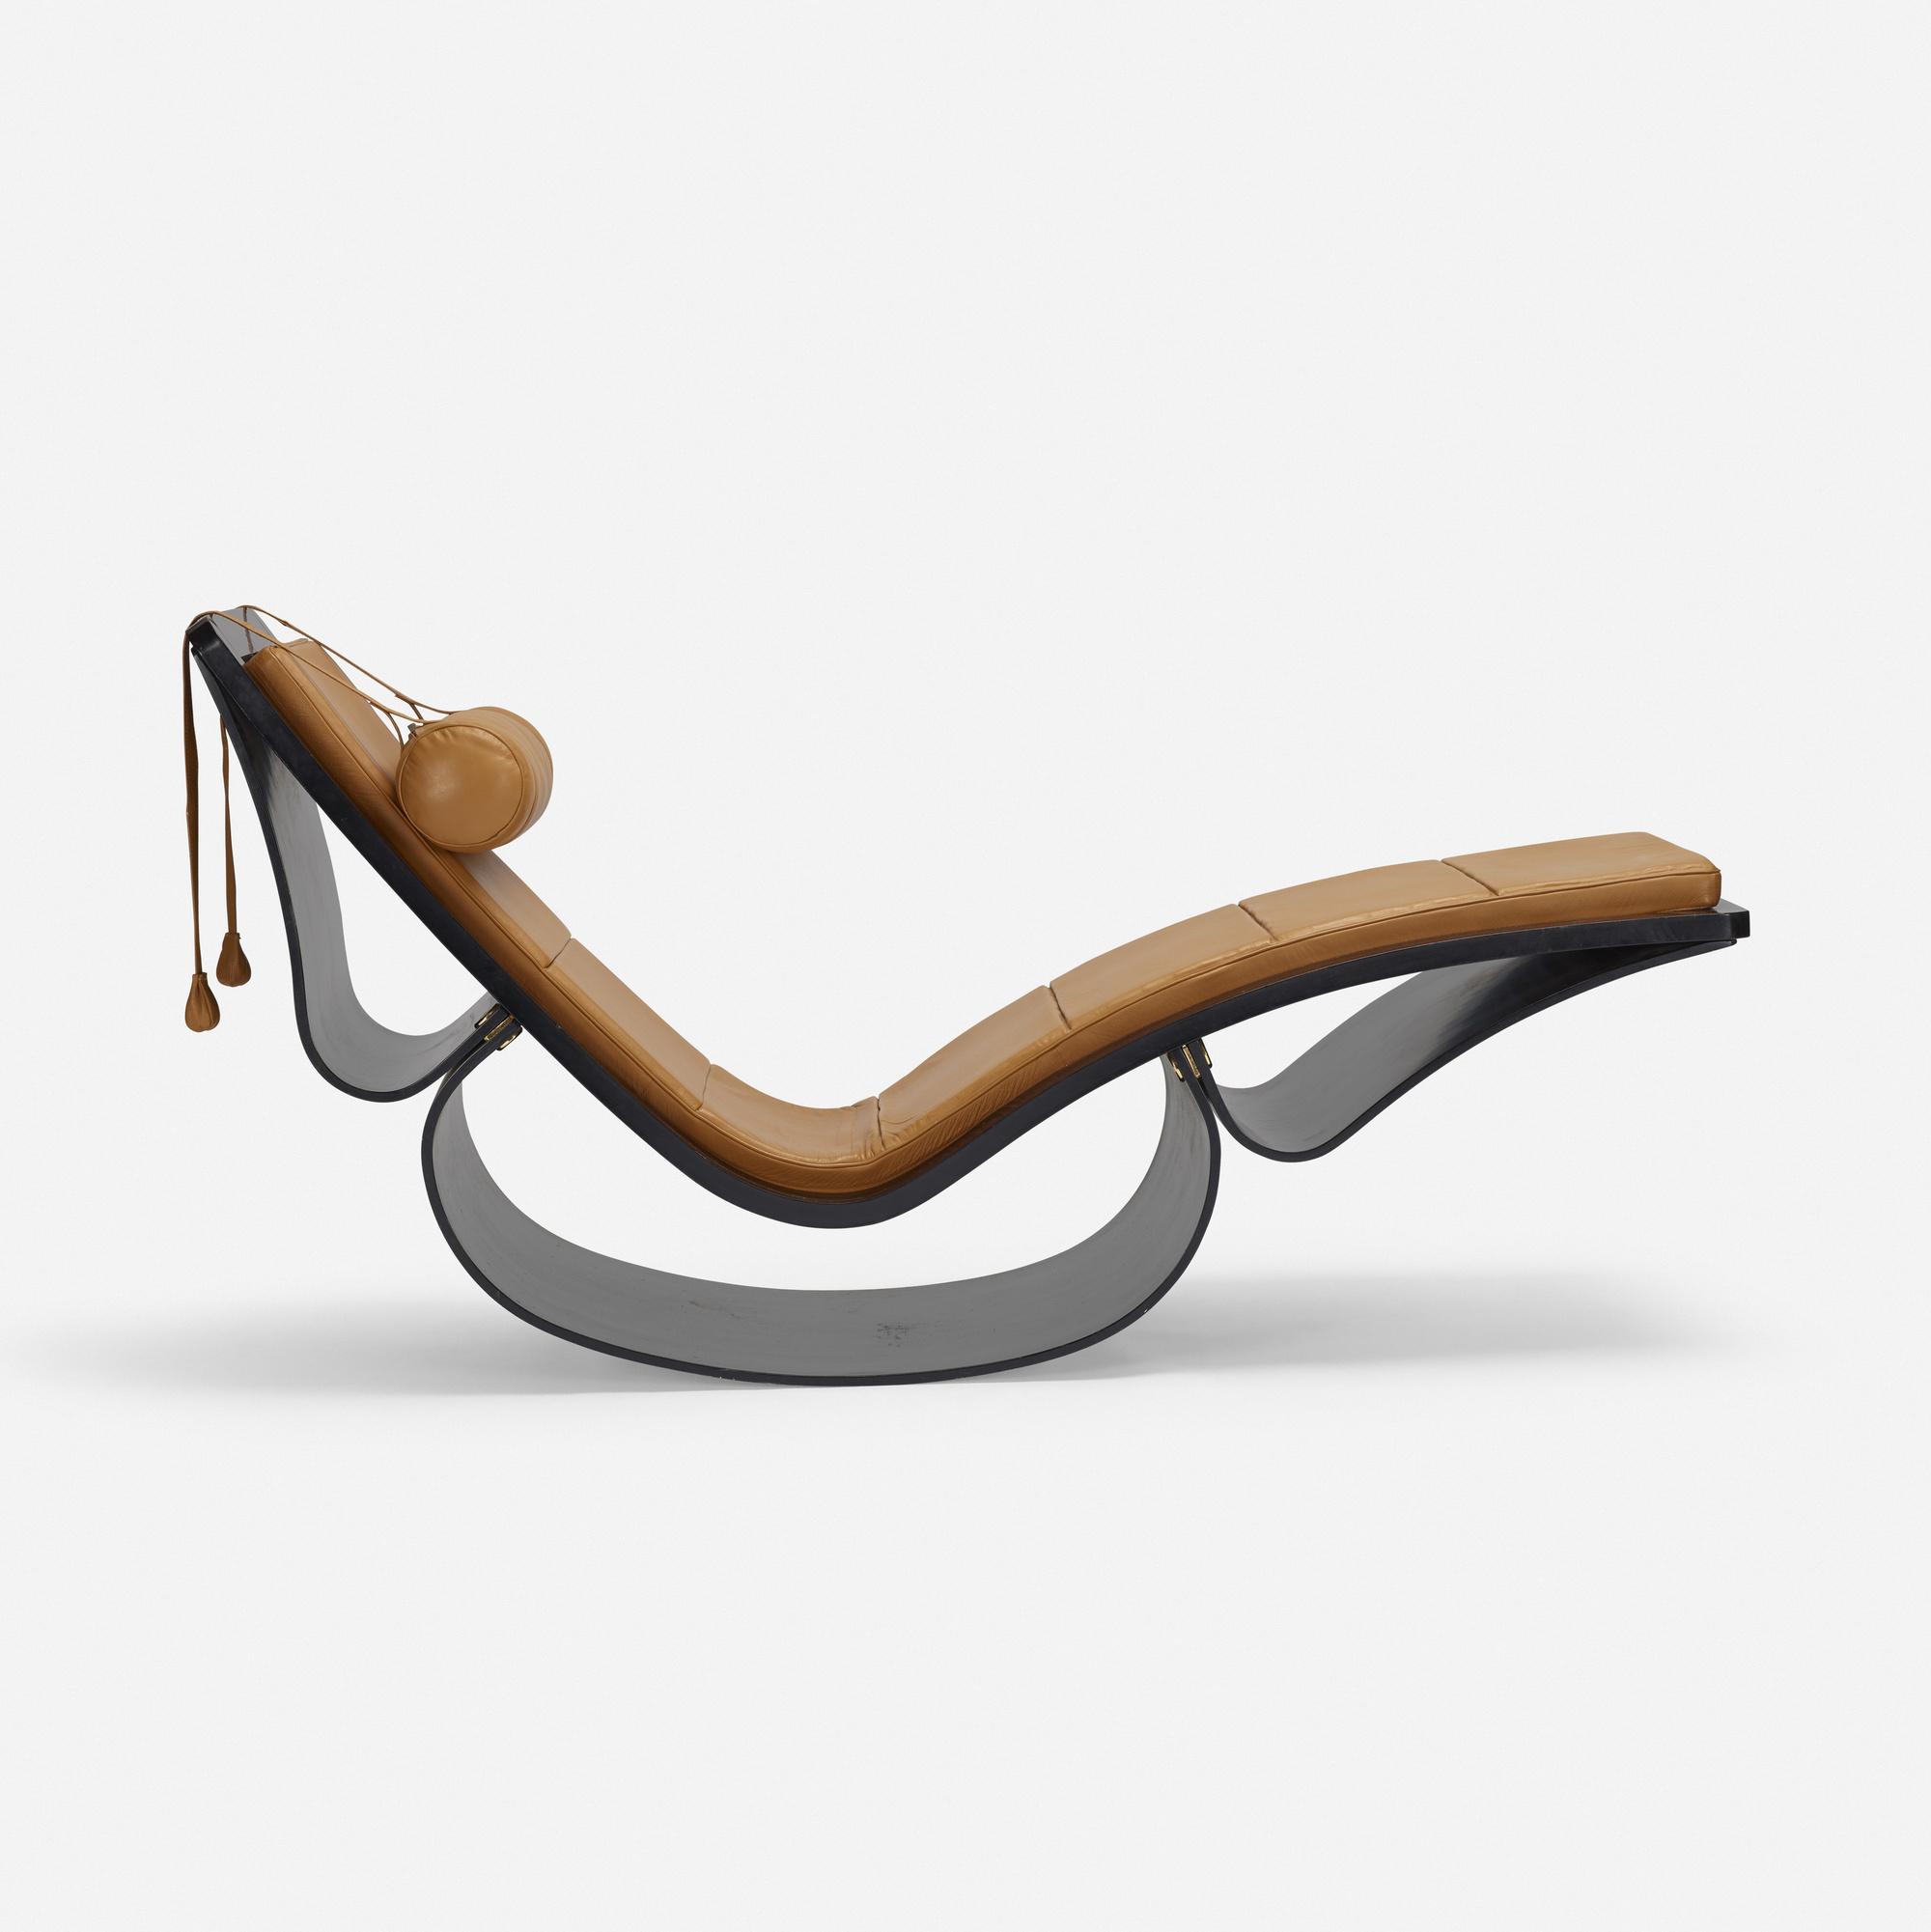 January ArtDesign17 NiemeyerRio Chaise 404Oscar Loungelt; DE9IH2